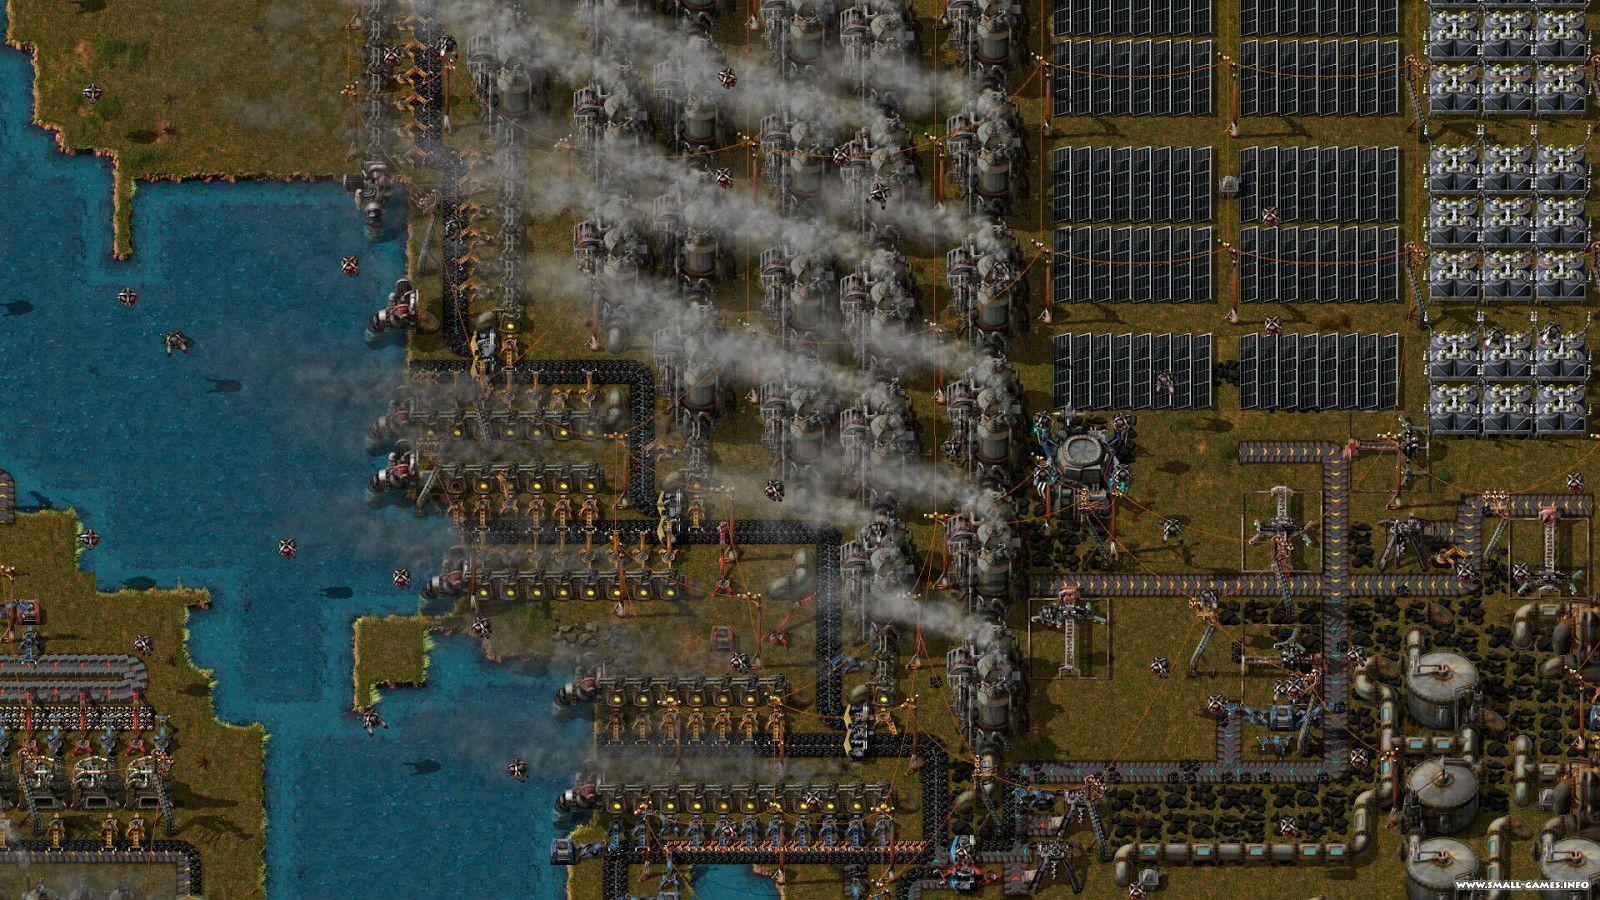 Factorio v0 17 68 [Steam Early Access] / + GOG v0 16 51 / +